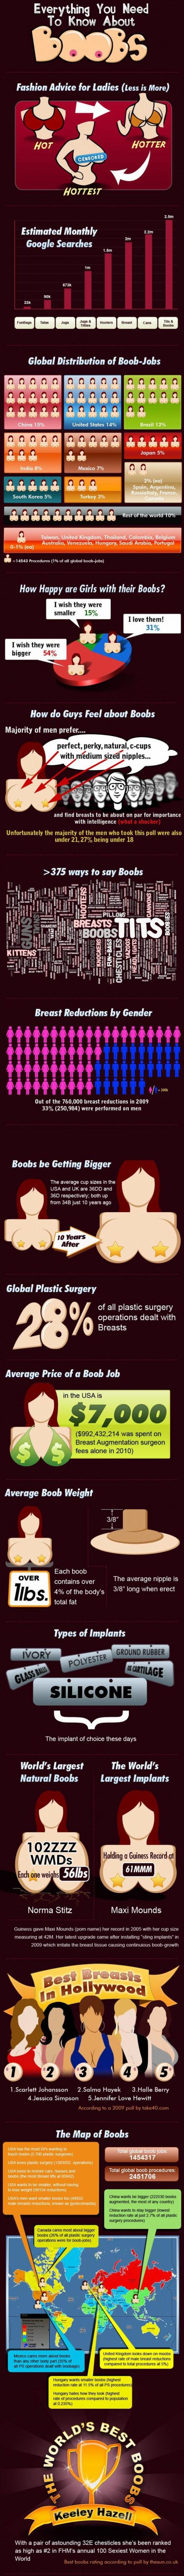 Boobs Infographic 560x7826